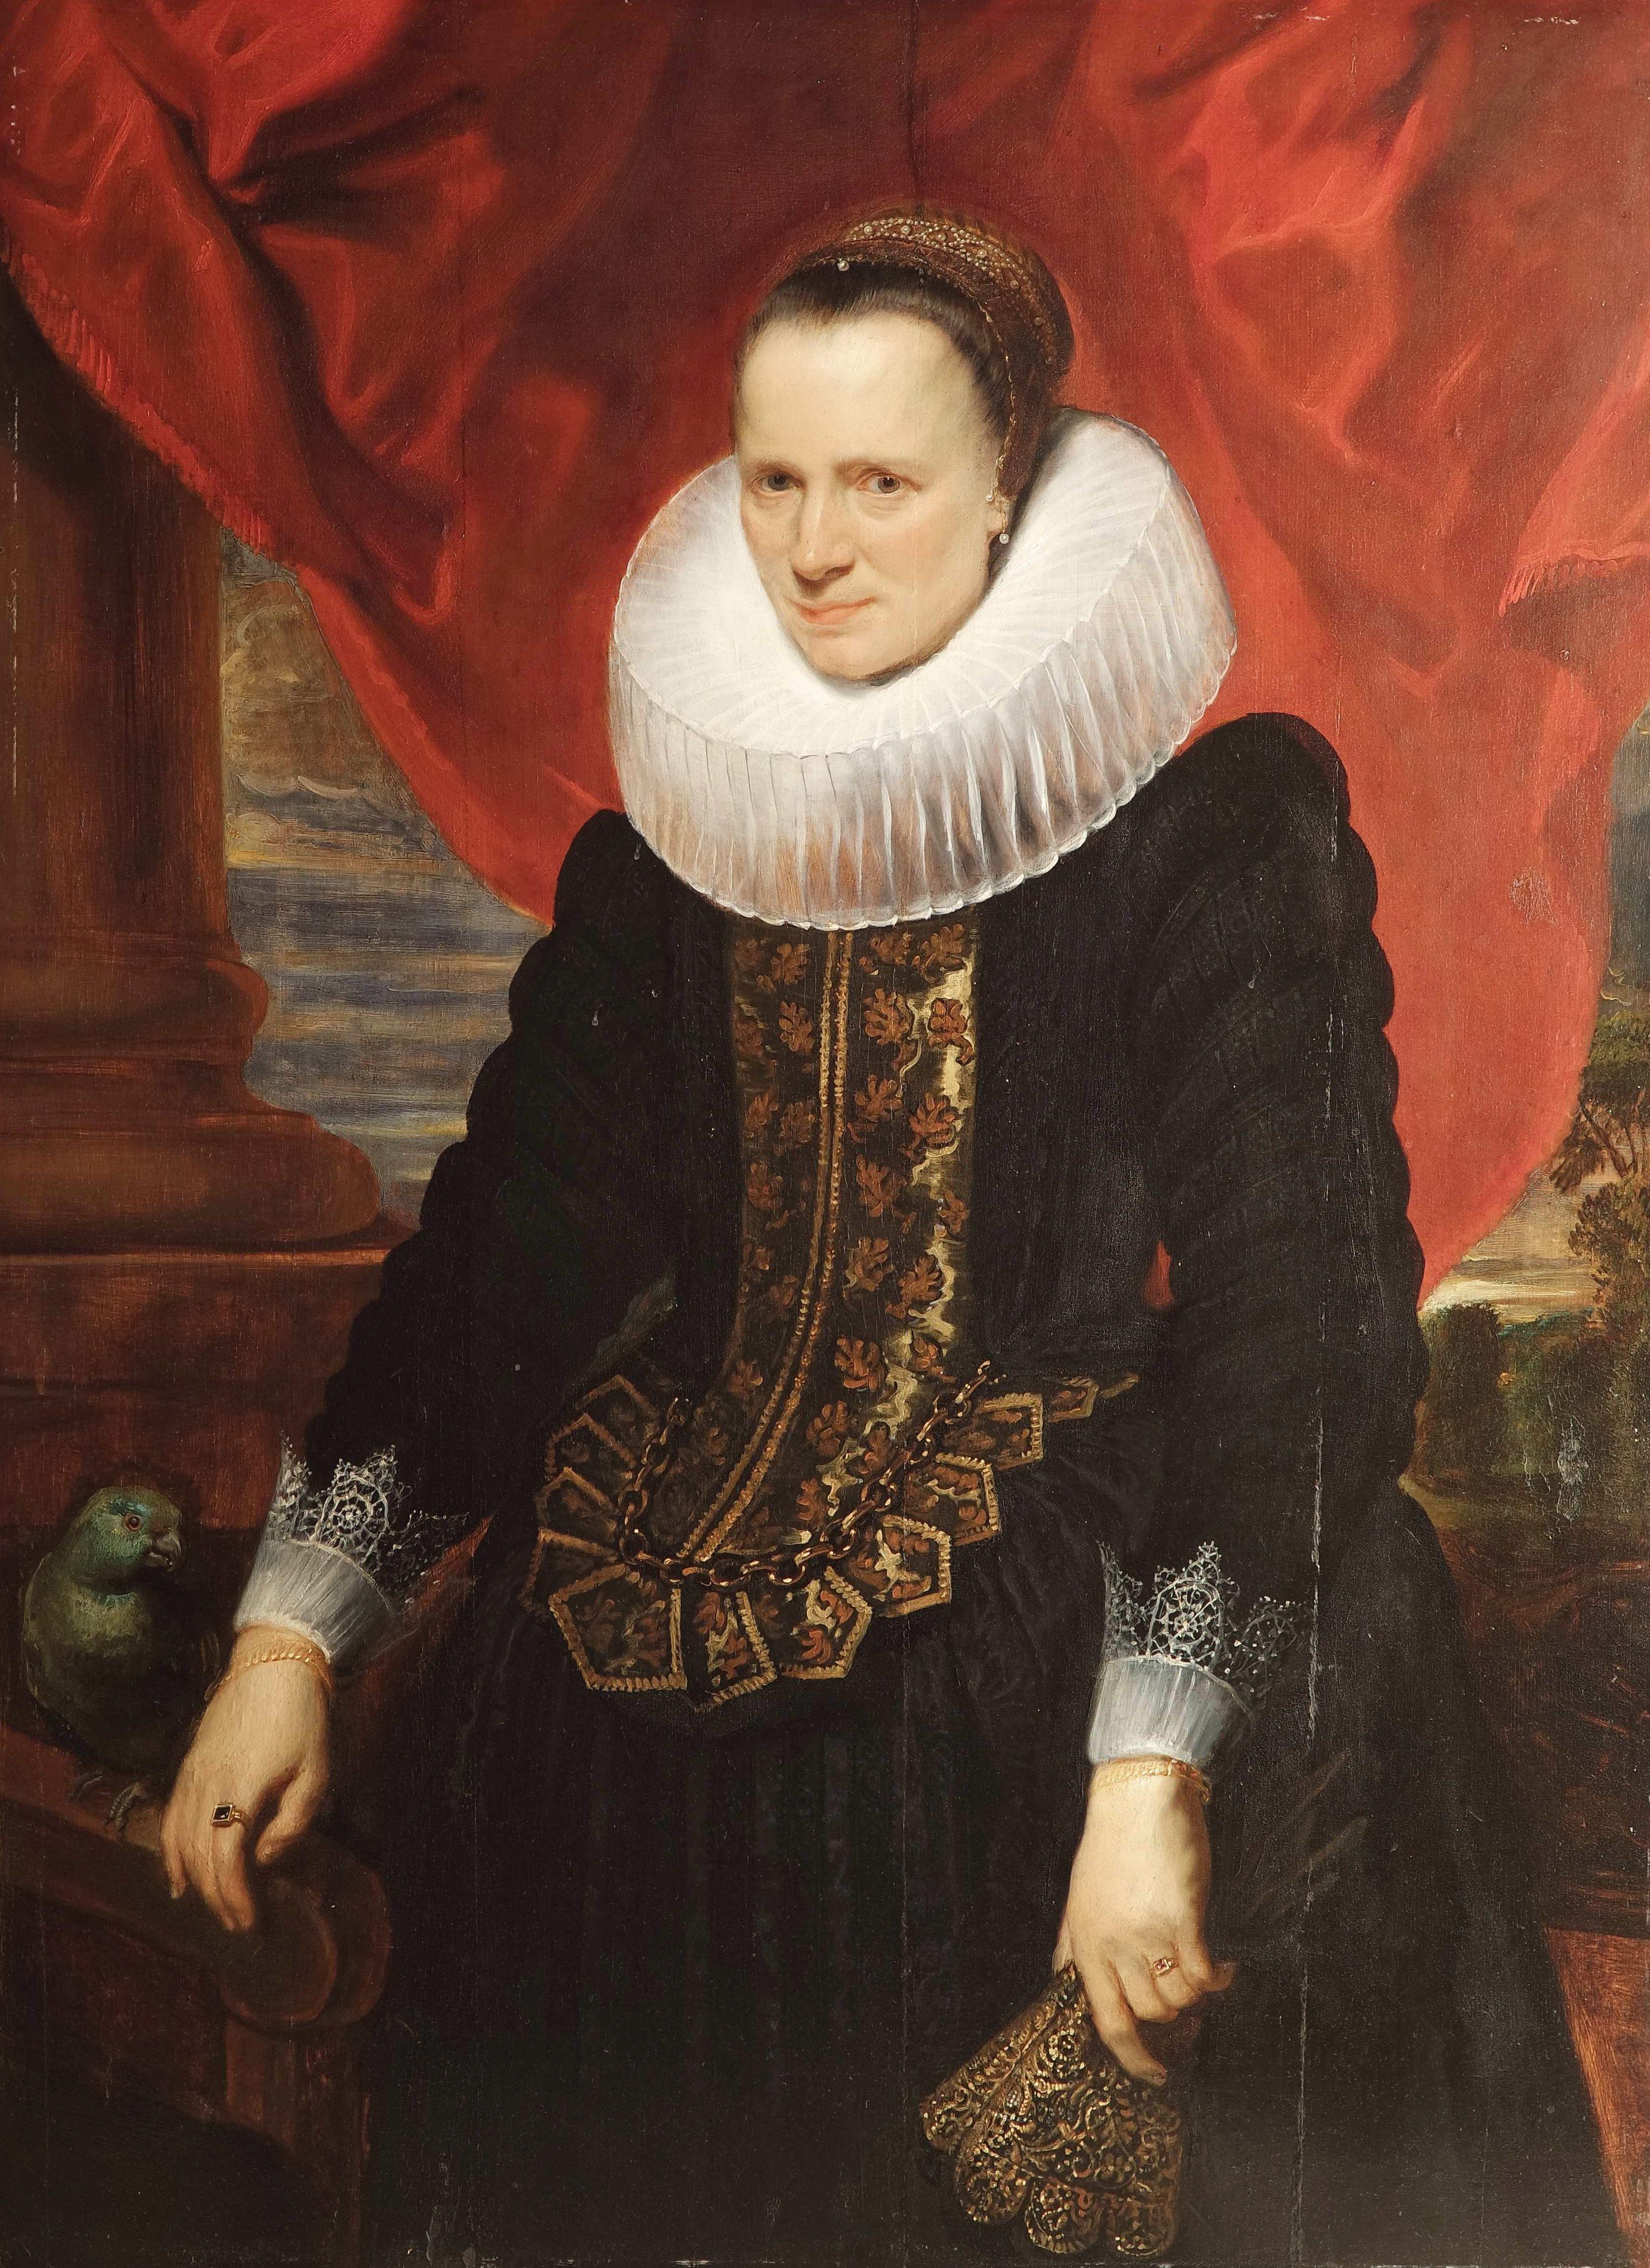 Portrait of a Noblewoman with a Parrot